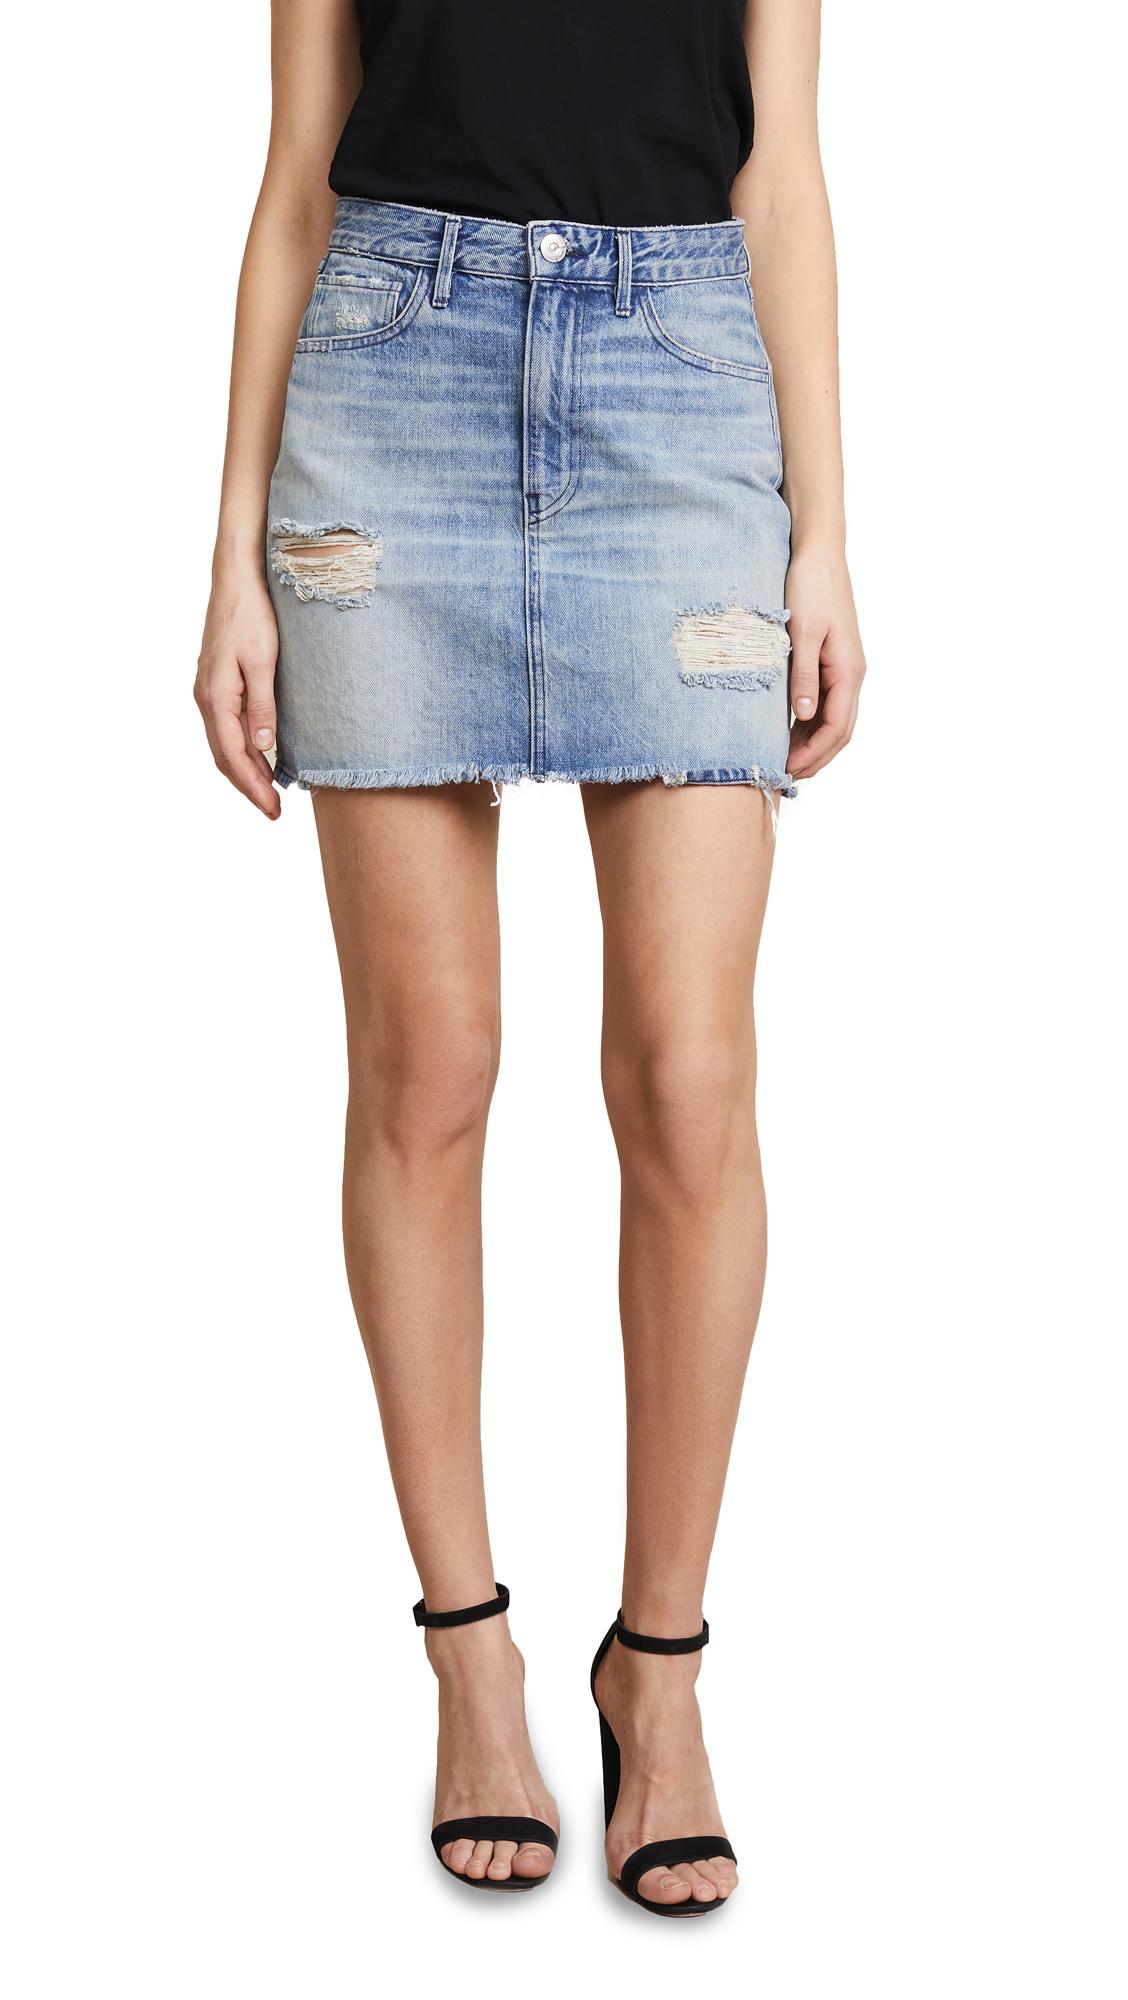 3x1 Celine Skirt In Laz